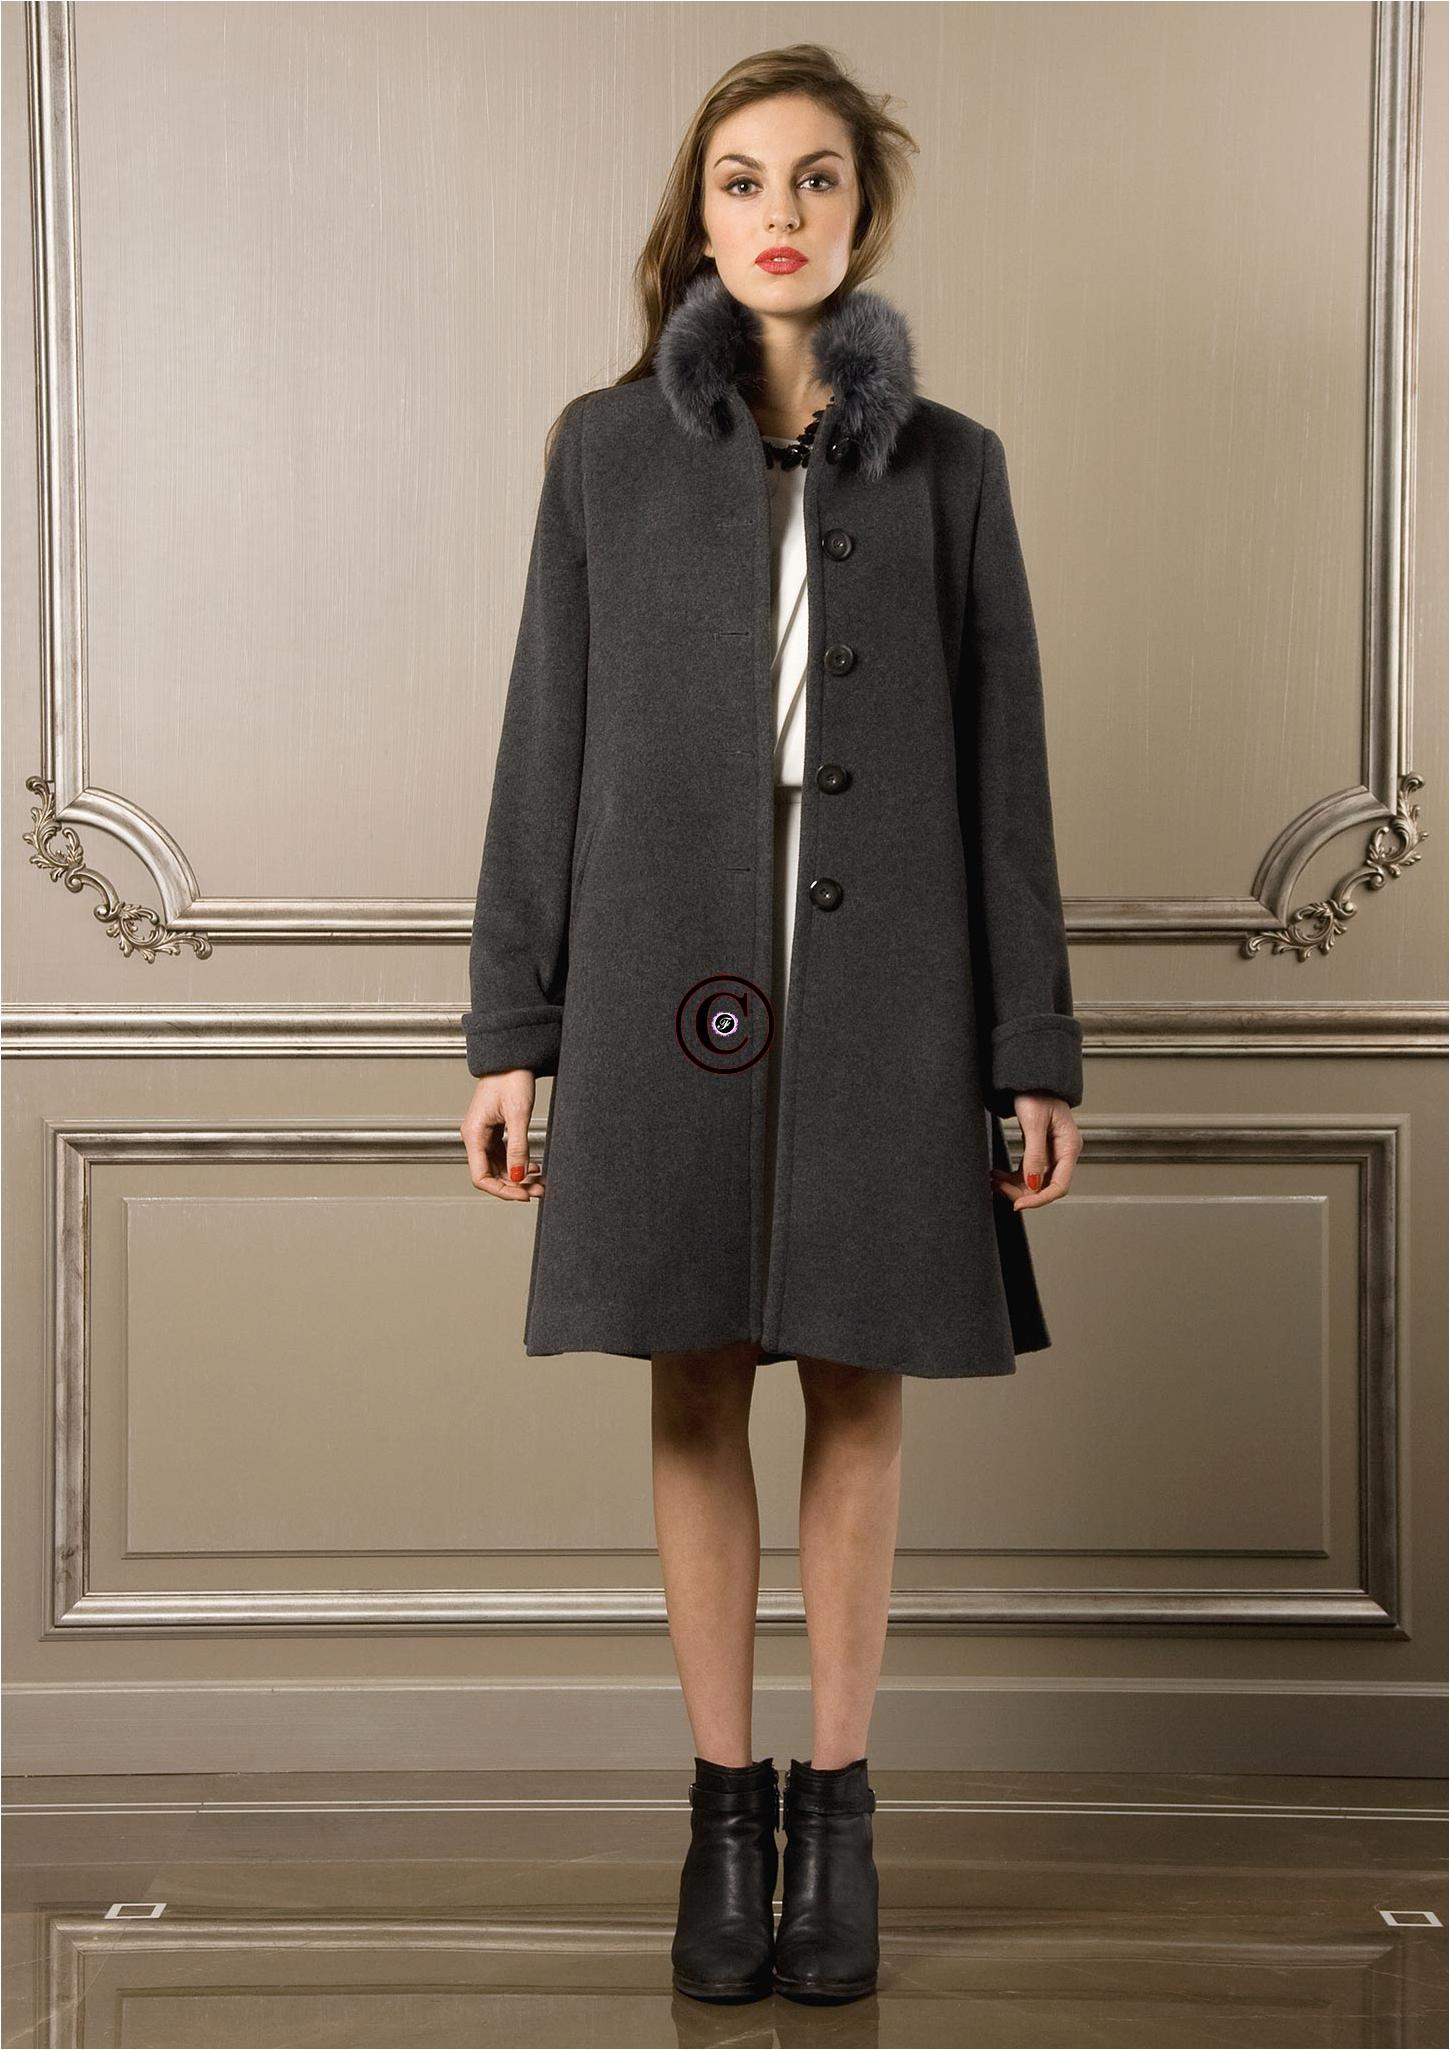 manteau gris osaka fourrure de renard. Black Bedroom Furniture Sets. Home Design Ideas